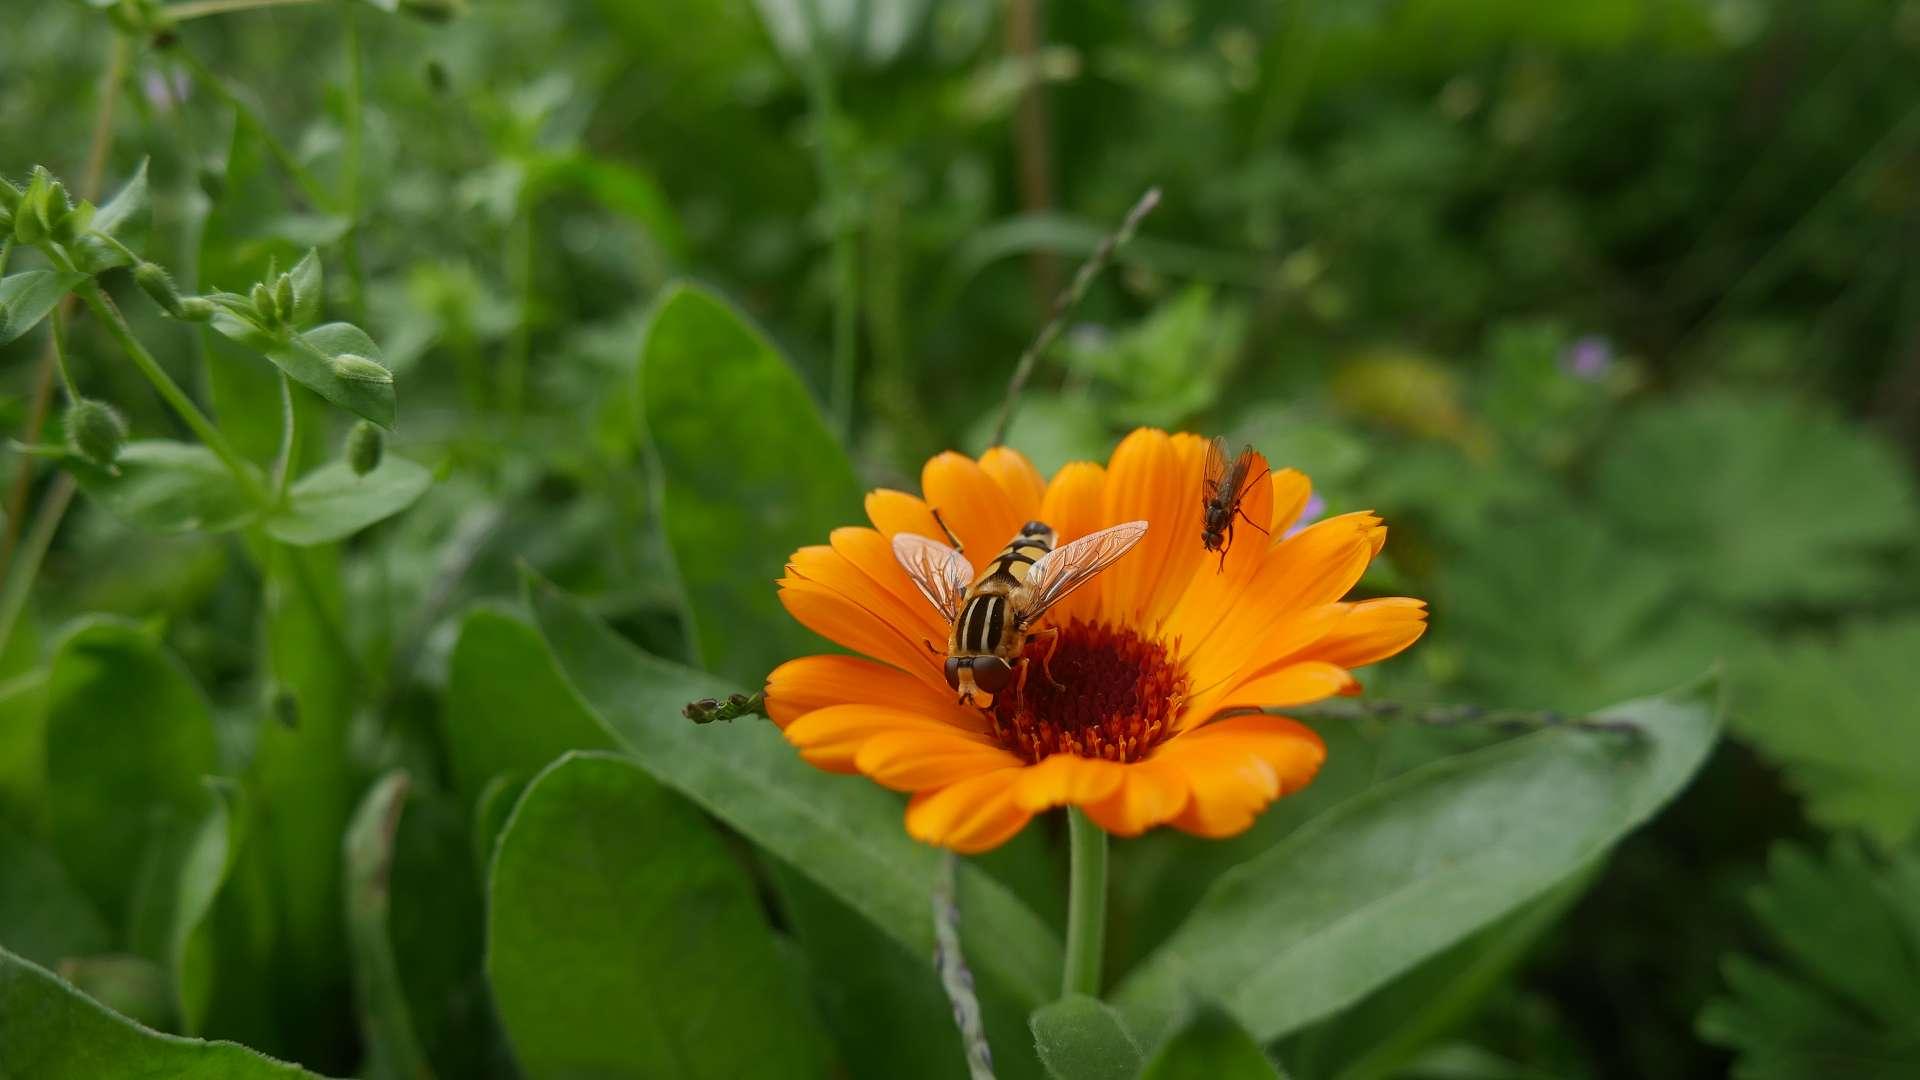 Bestäubung gegen Blattläuse Naturgarten giftfreier Garten Gärtnern ohne Gift